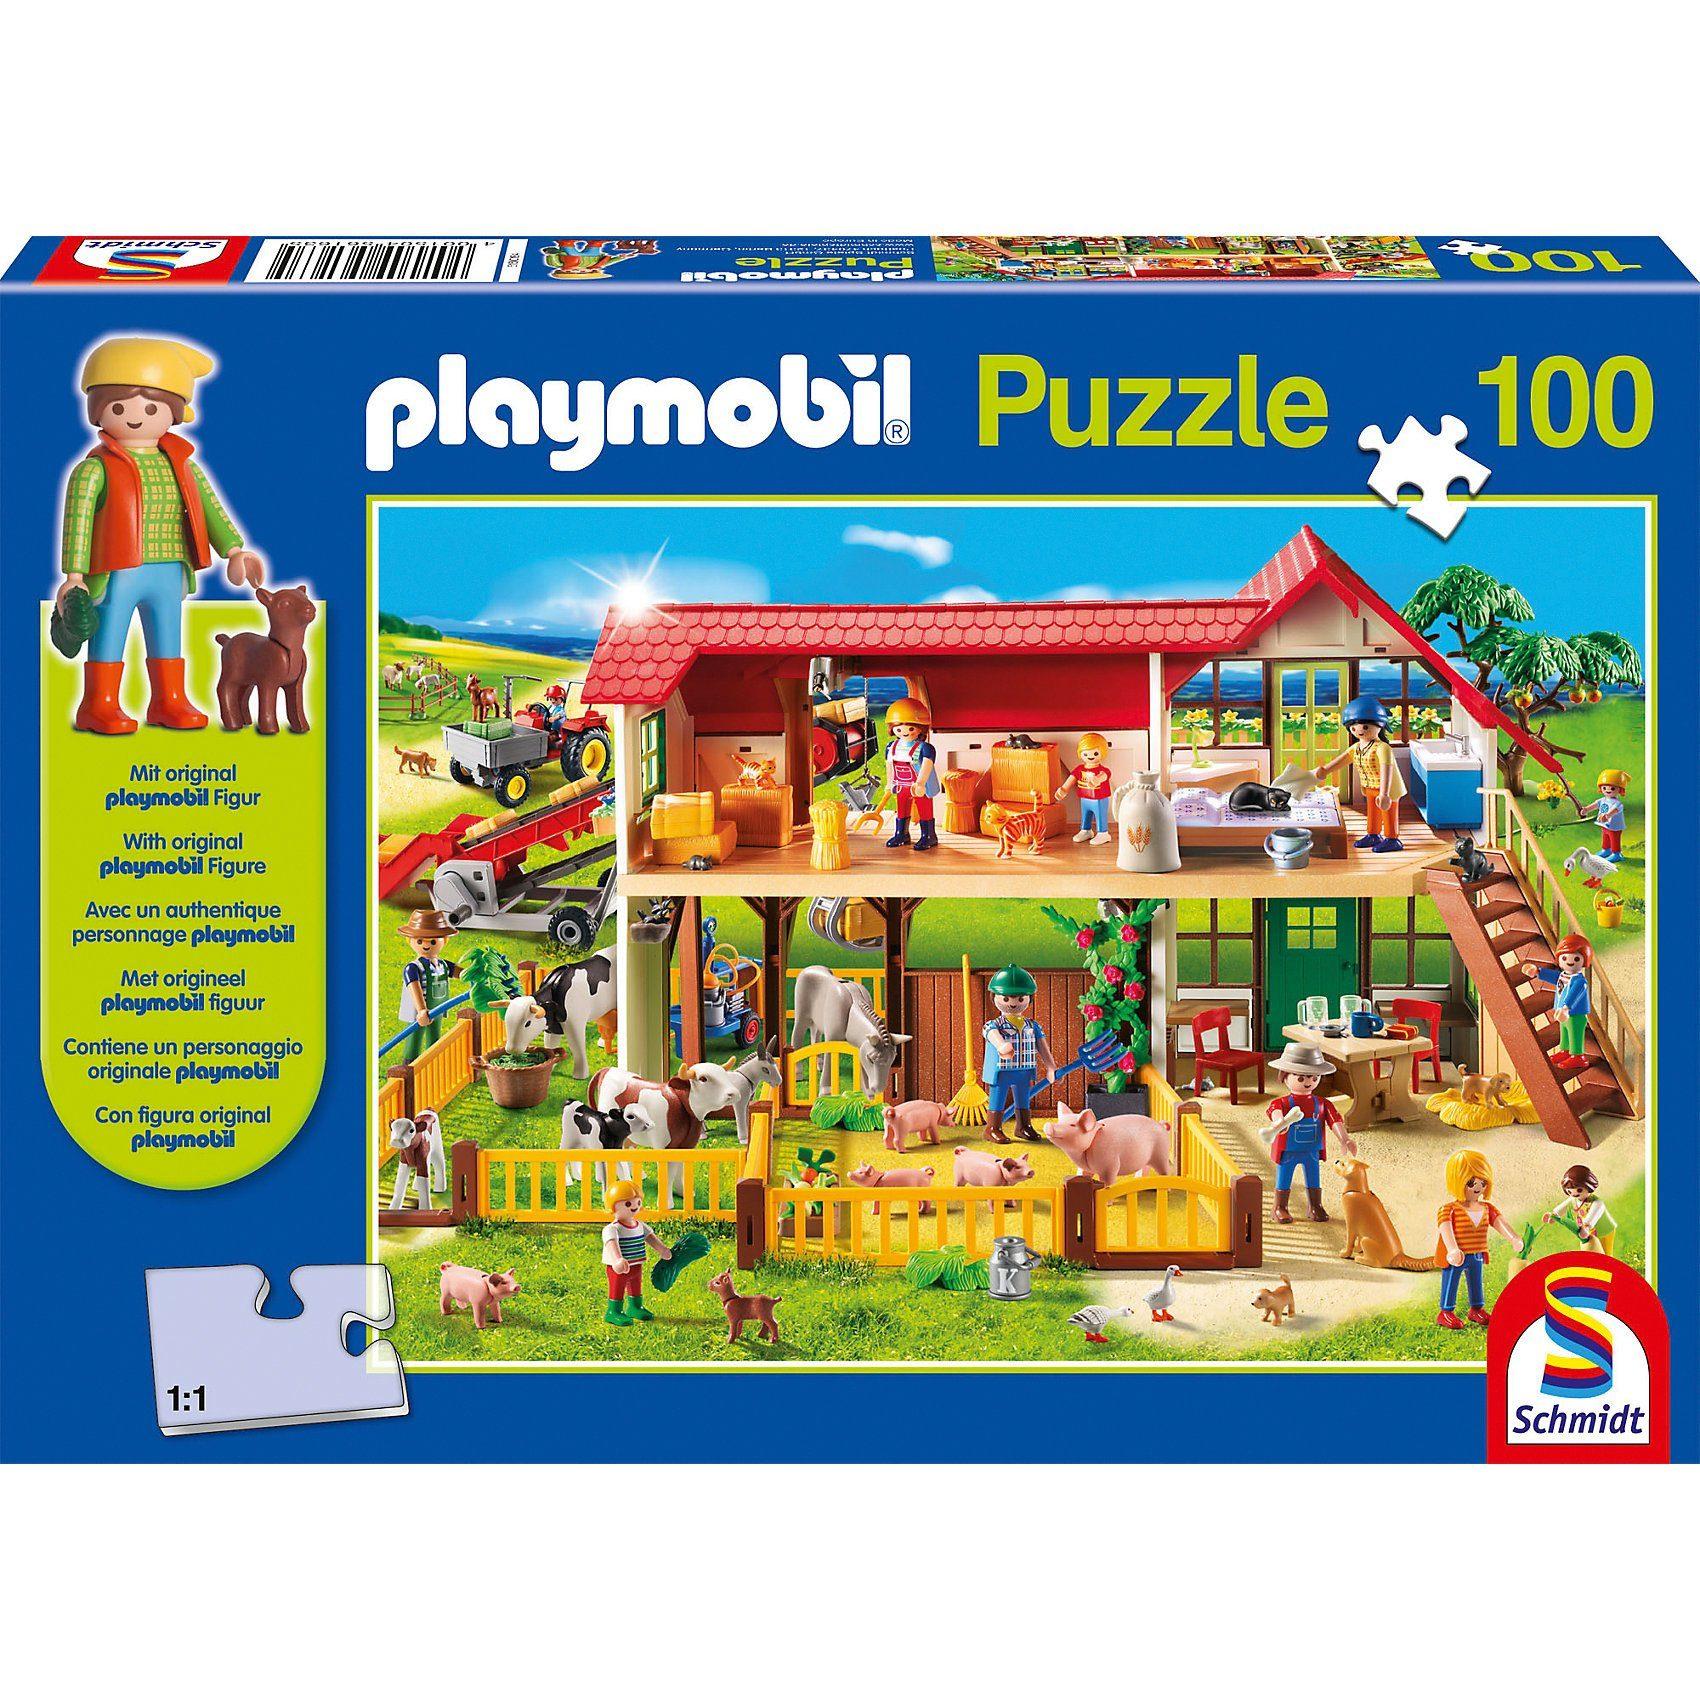 Schmidt Spiele Puzzle Playmobil (inkl. Figur), Bauernhof, 100 Teile